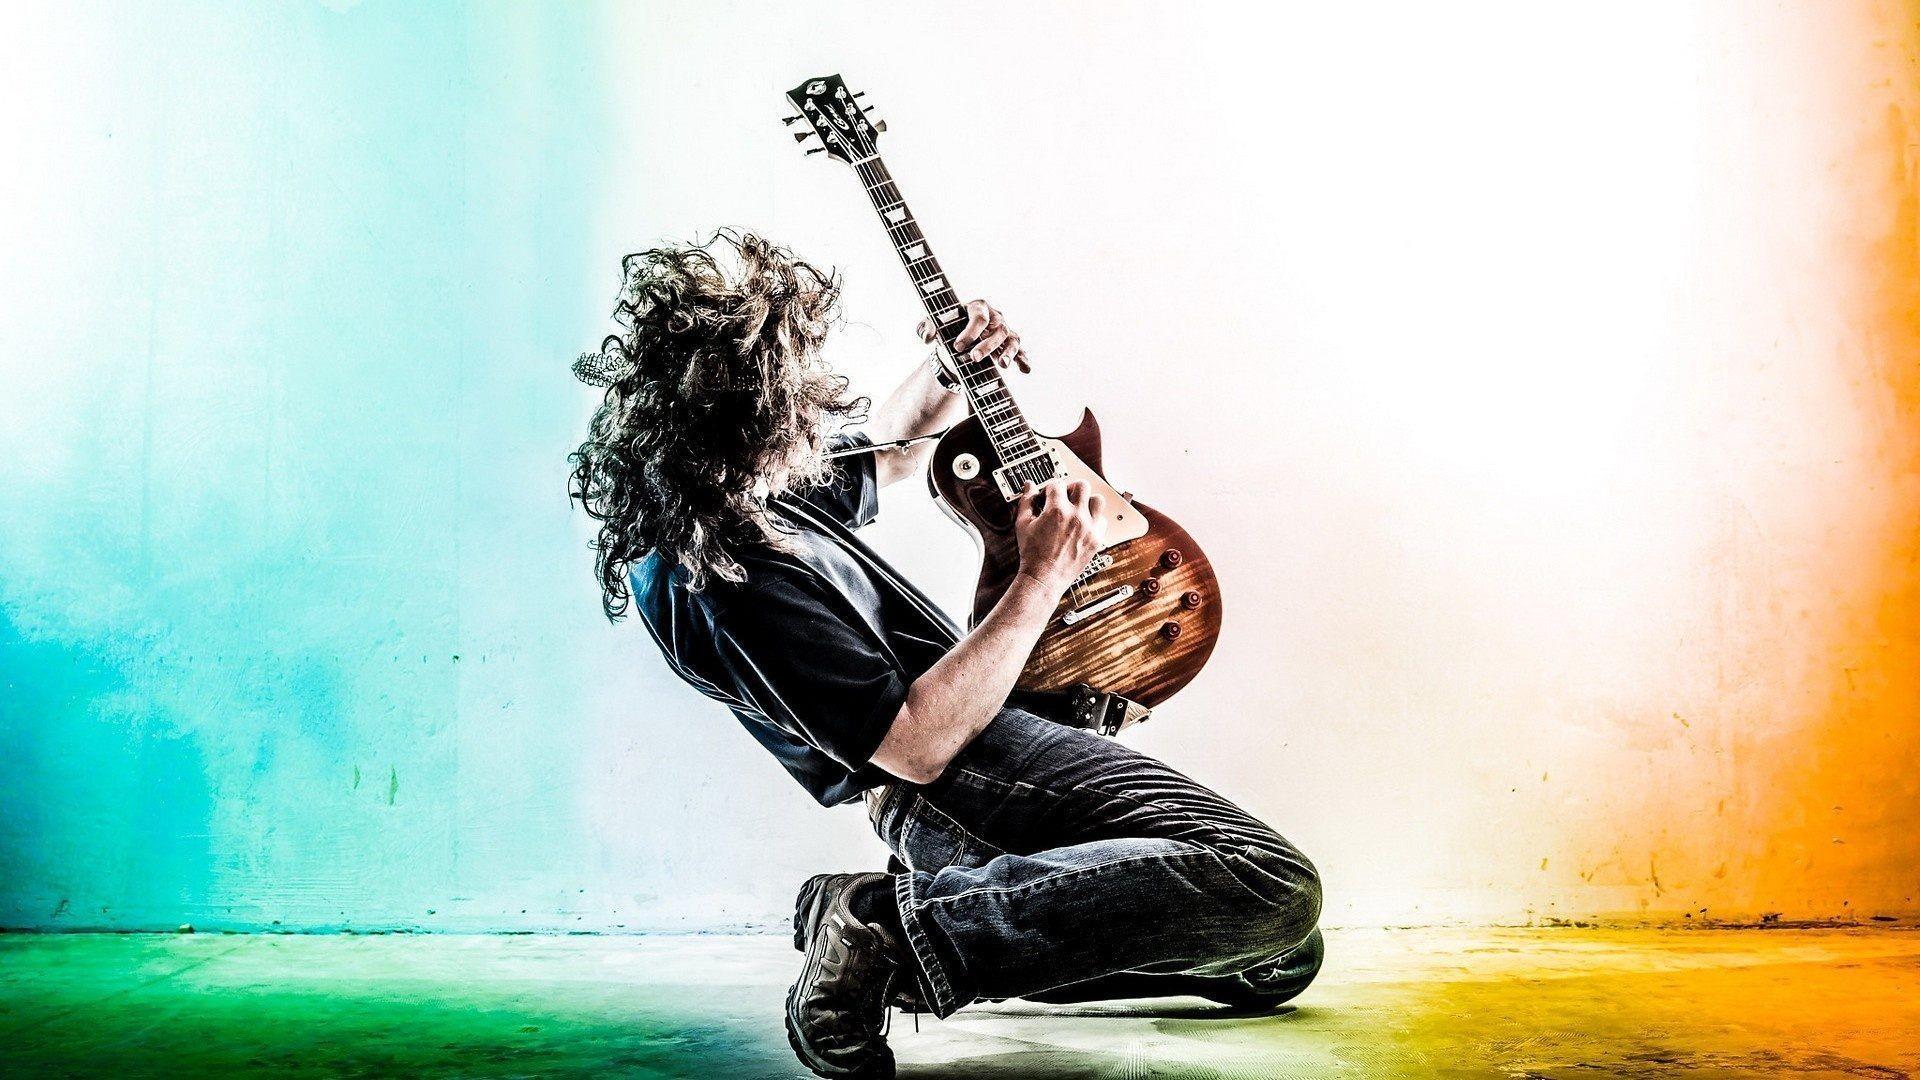 hd guitar wallpaper â